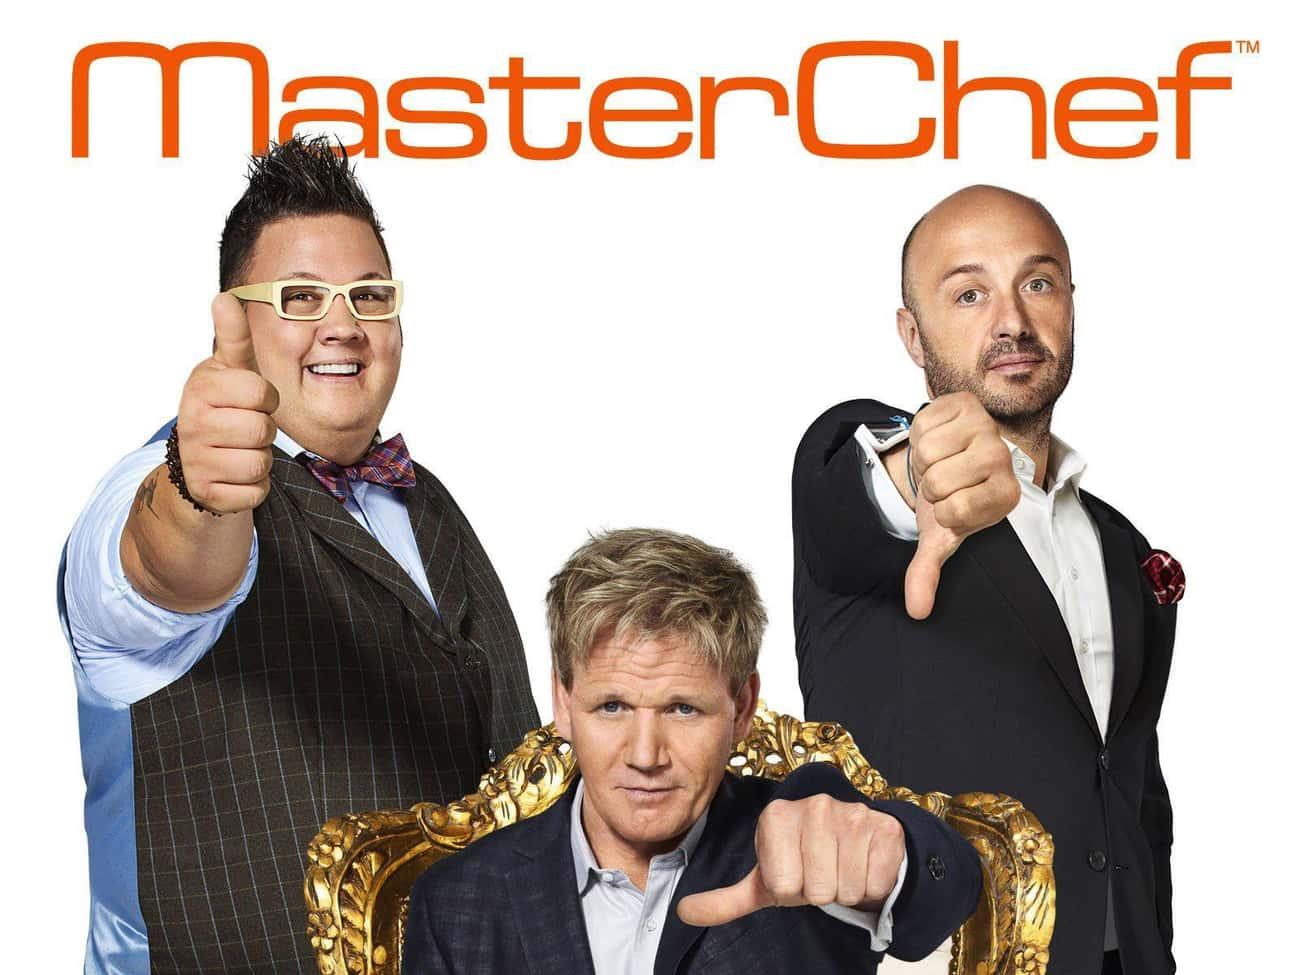 MasterChef - Season 3 is listed (or ranked) 3 on the list The Best Seasons of 'MasterChef' (U.S.)